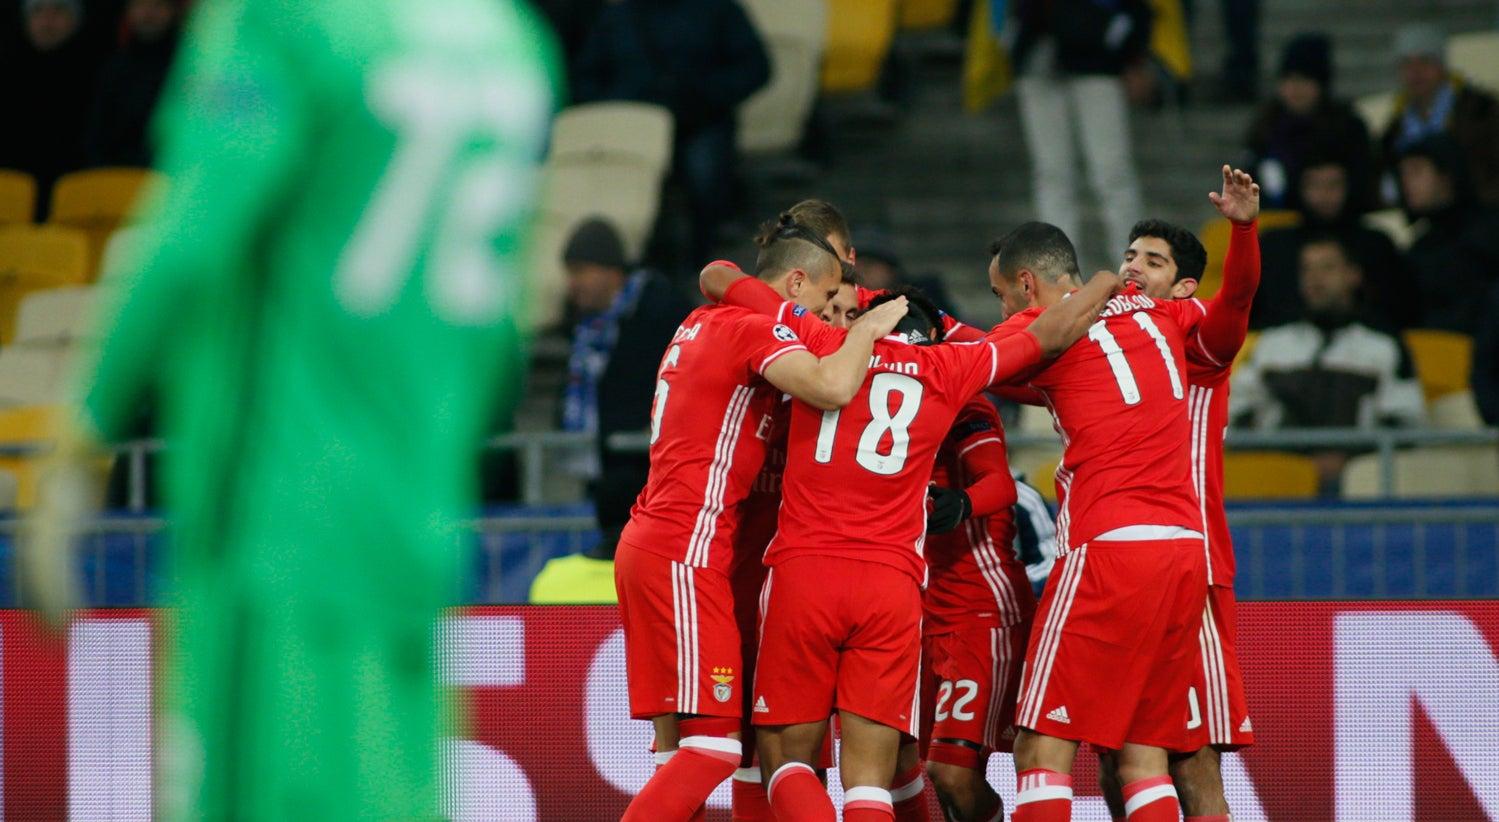 Dínamo Kiev - SL Benfica - Liga dos Campeões